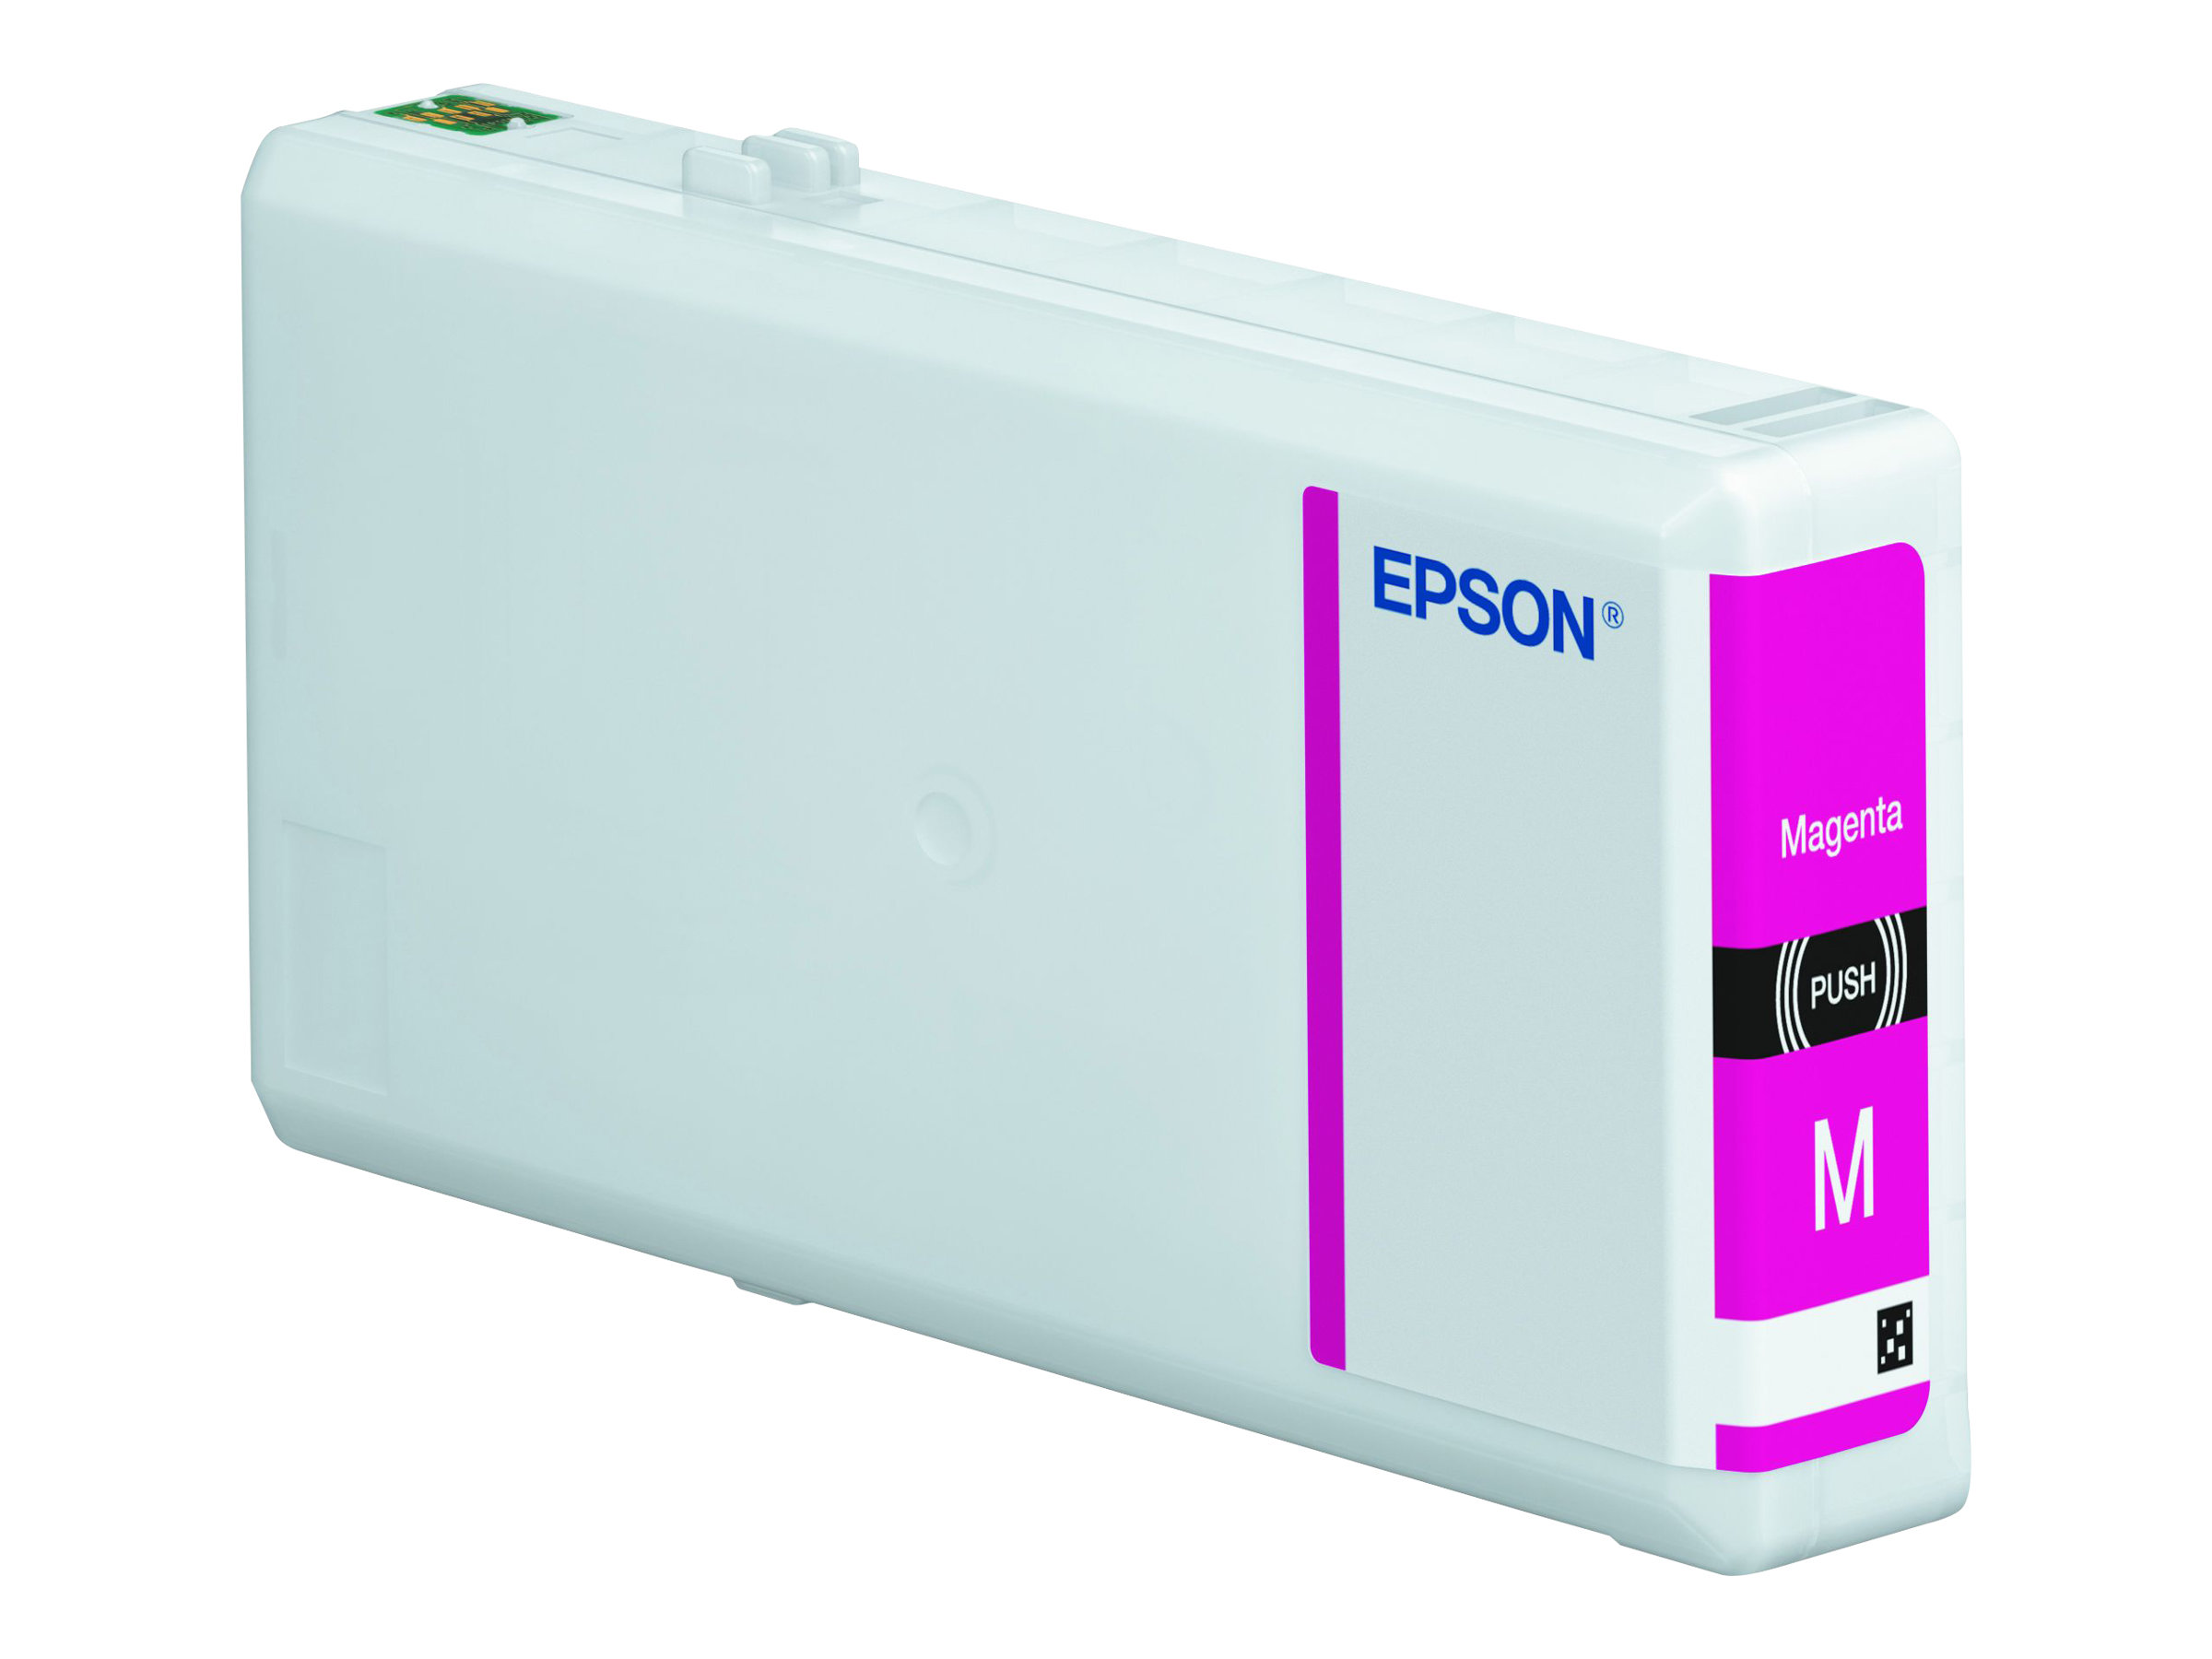 Epson 79XL - 17.1 ml - XL - Magenta - Original